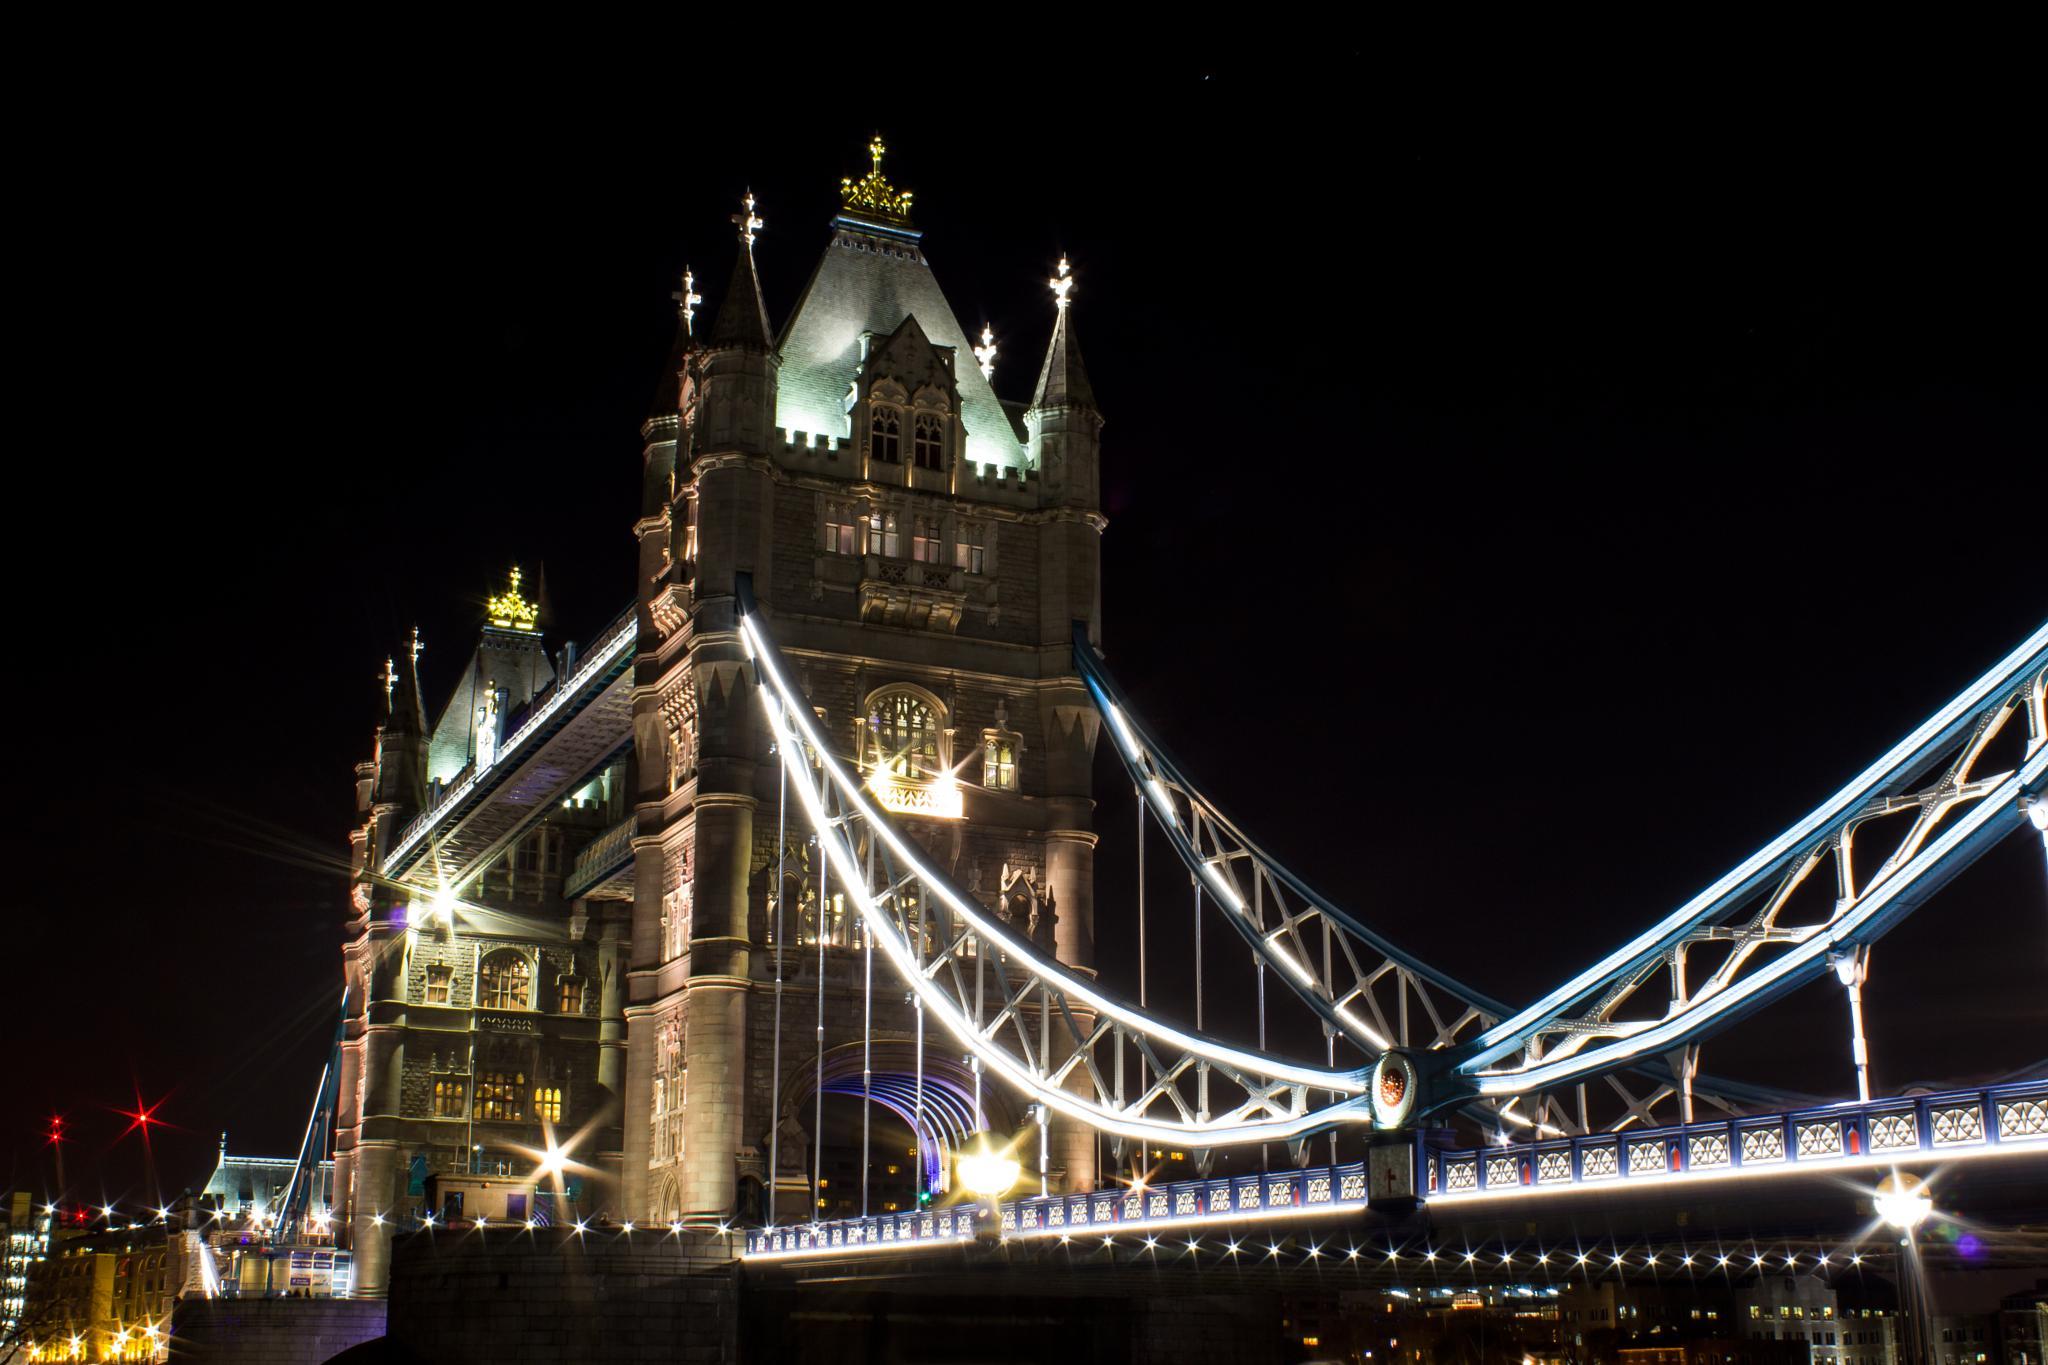 Tower Bridge3 by thomashaage